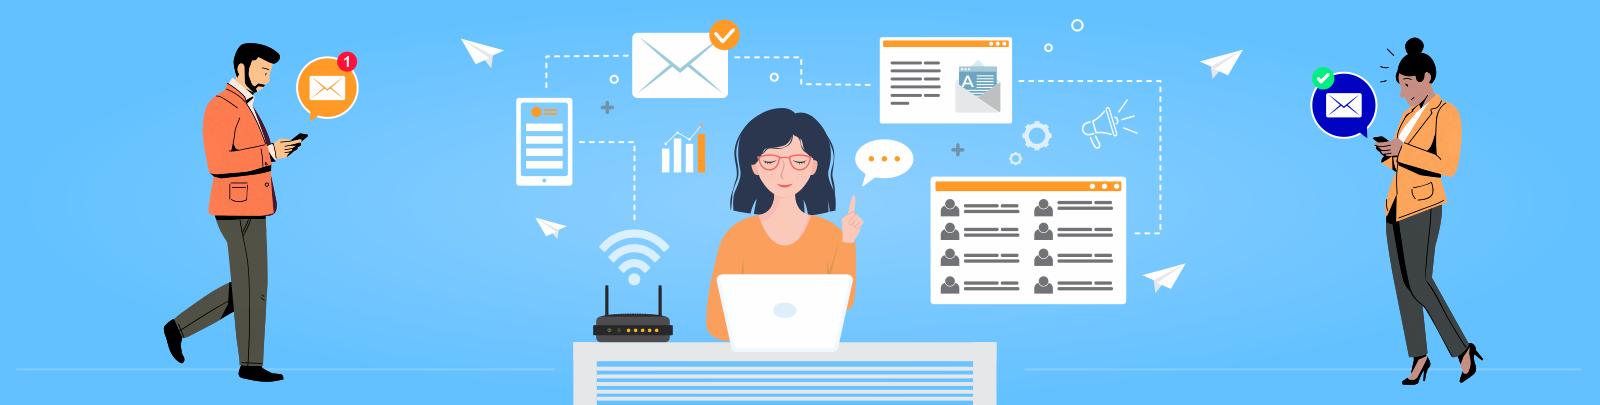 SMS Marketing no WSpot